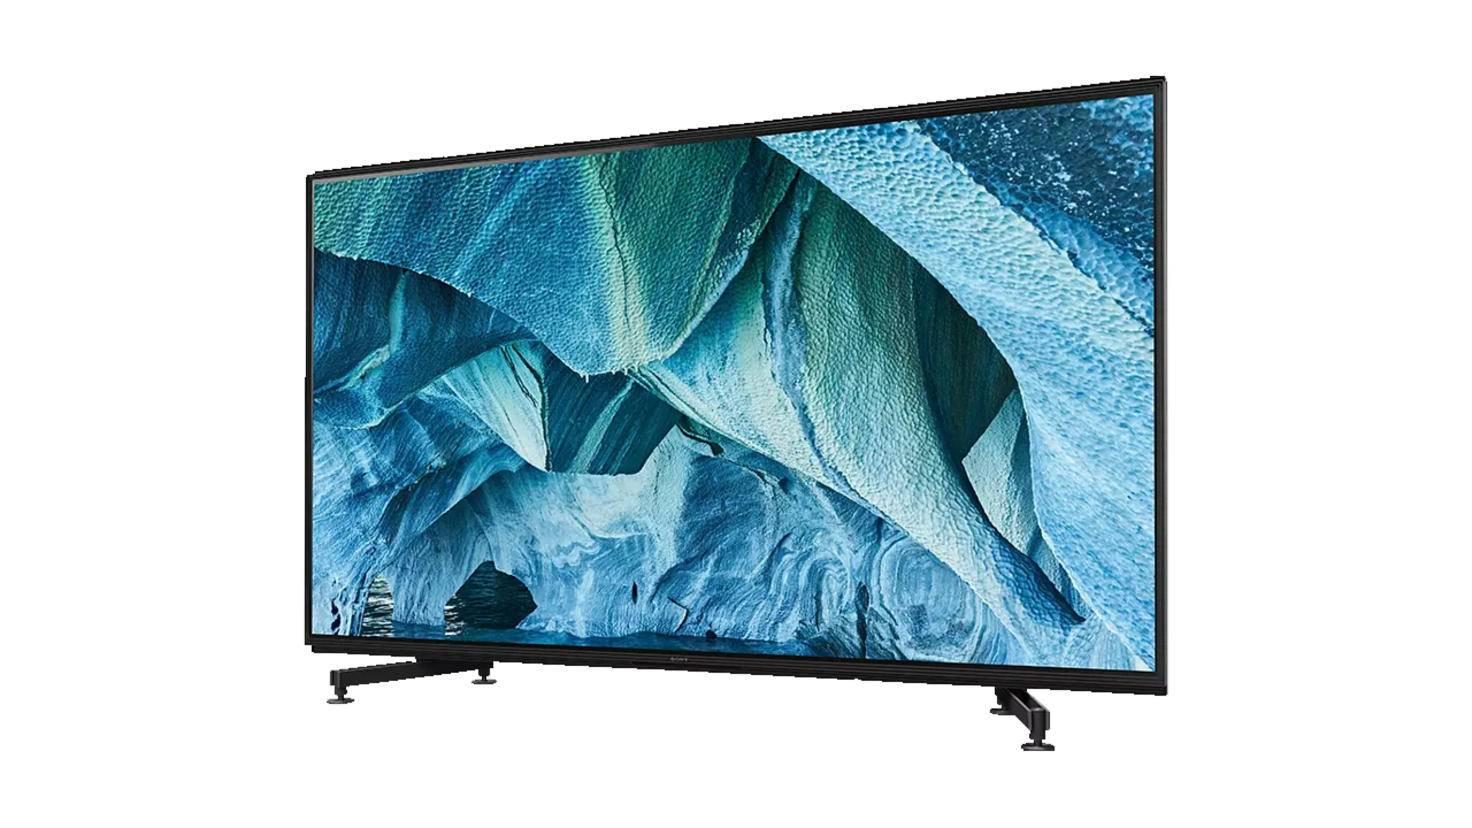 Sony KD-85ZG9 8K-Fernseher 85 Zoll